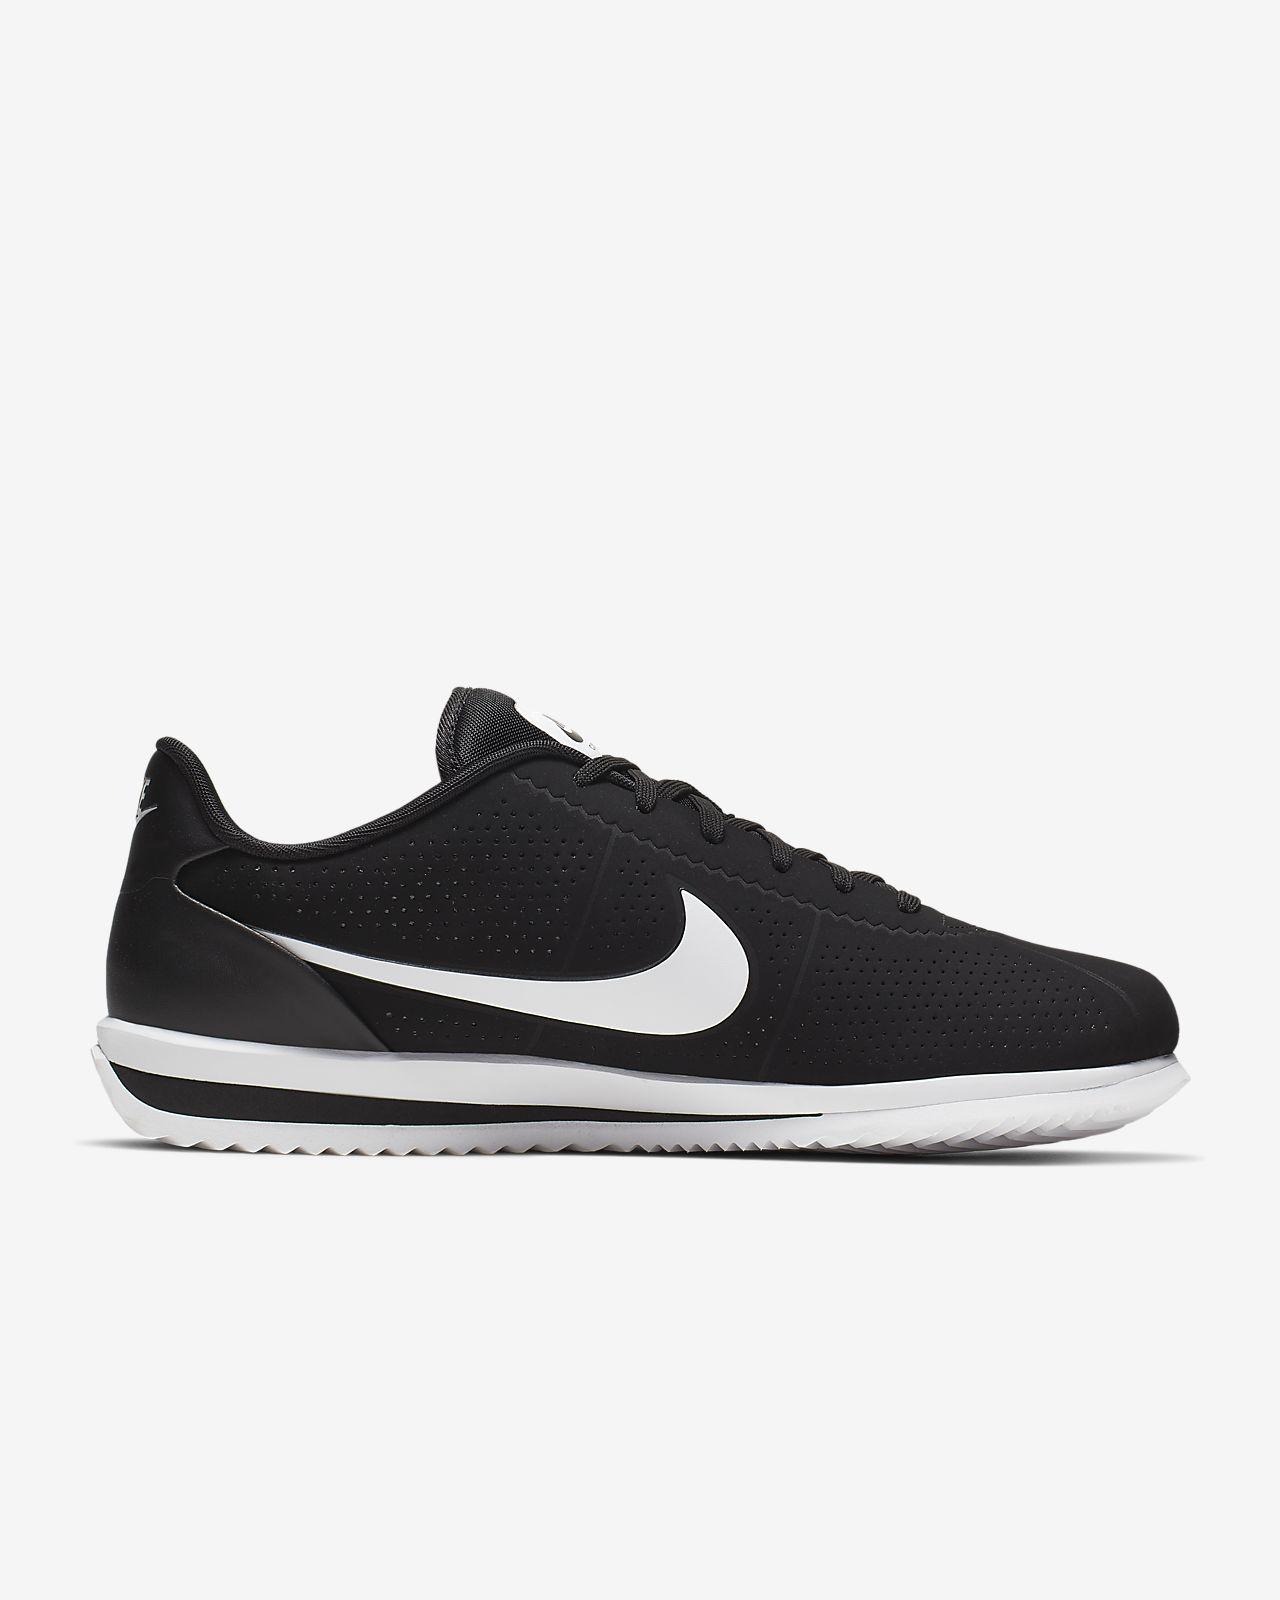 Moire Pour HommeMa Cortez Chaussure Nike Ultra mnNv0w8O